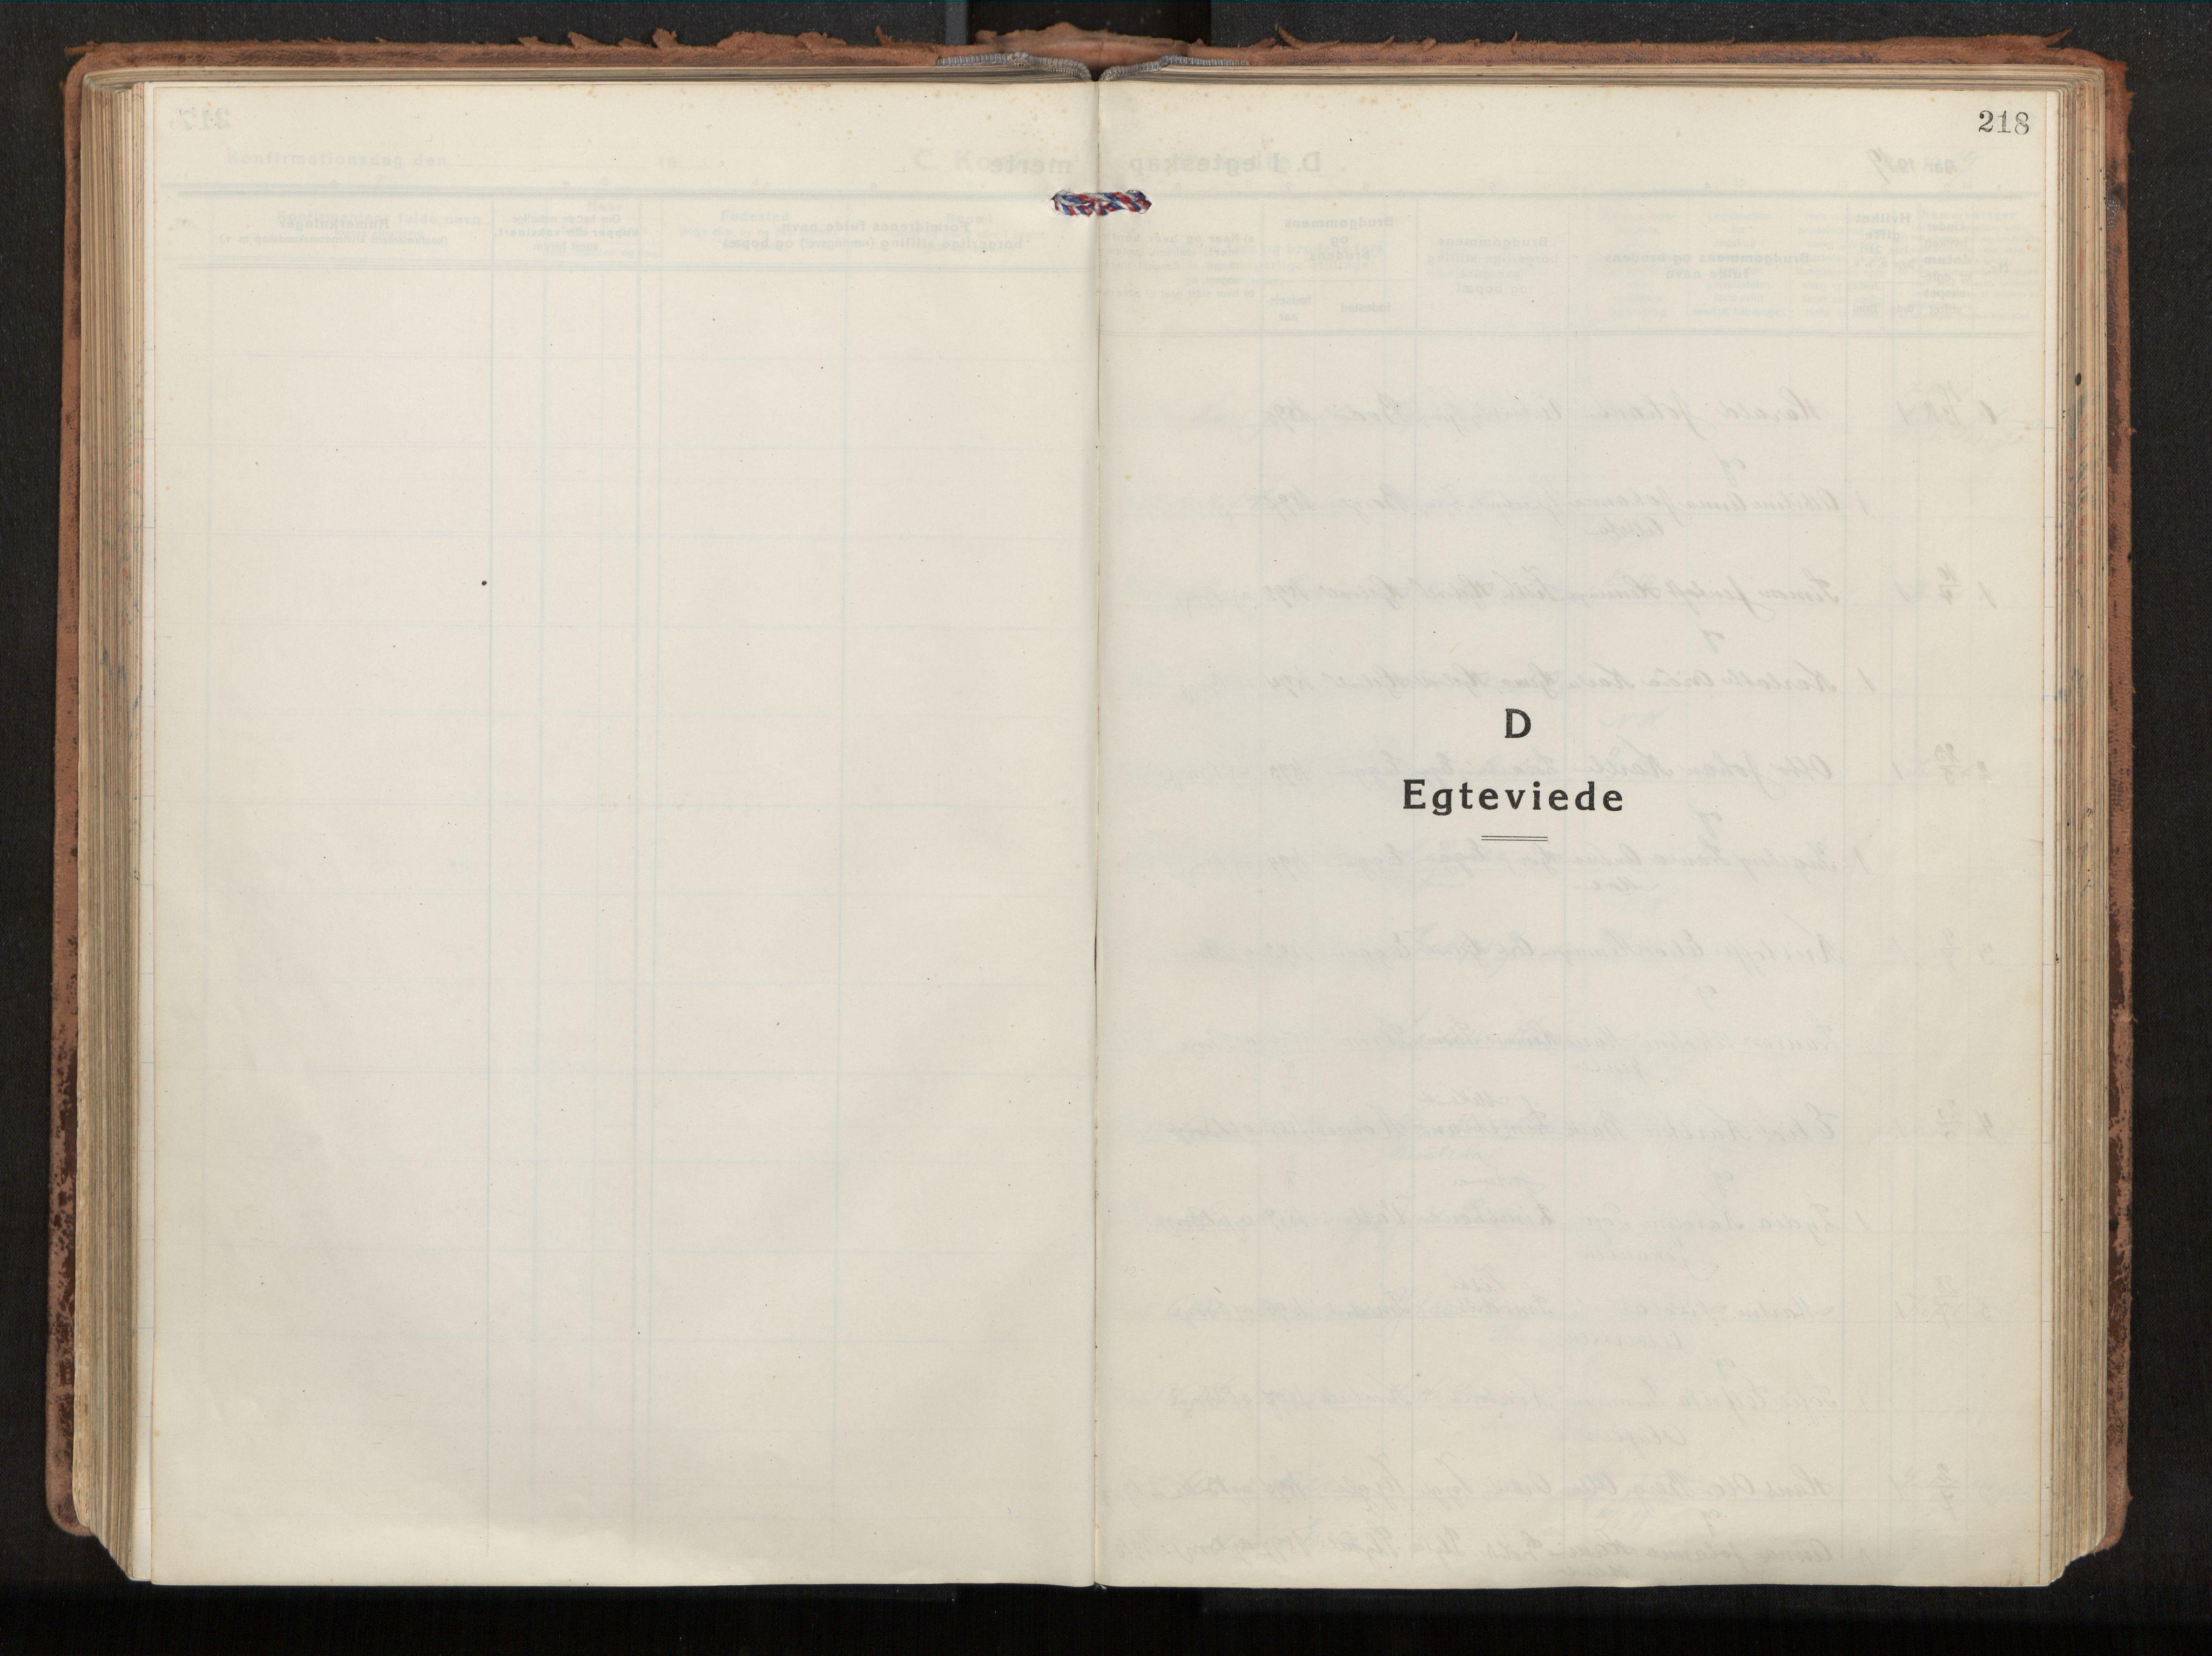 SAT, Ministerialprotokoller, klokkerbøker og fødselsregistre - Nordland, 880/L1136: Ministerialbok nr. 880A10, 1919-1927, s. 218